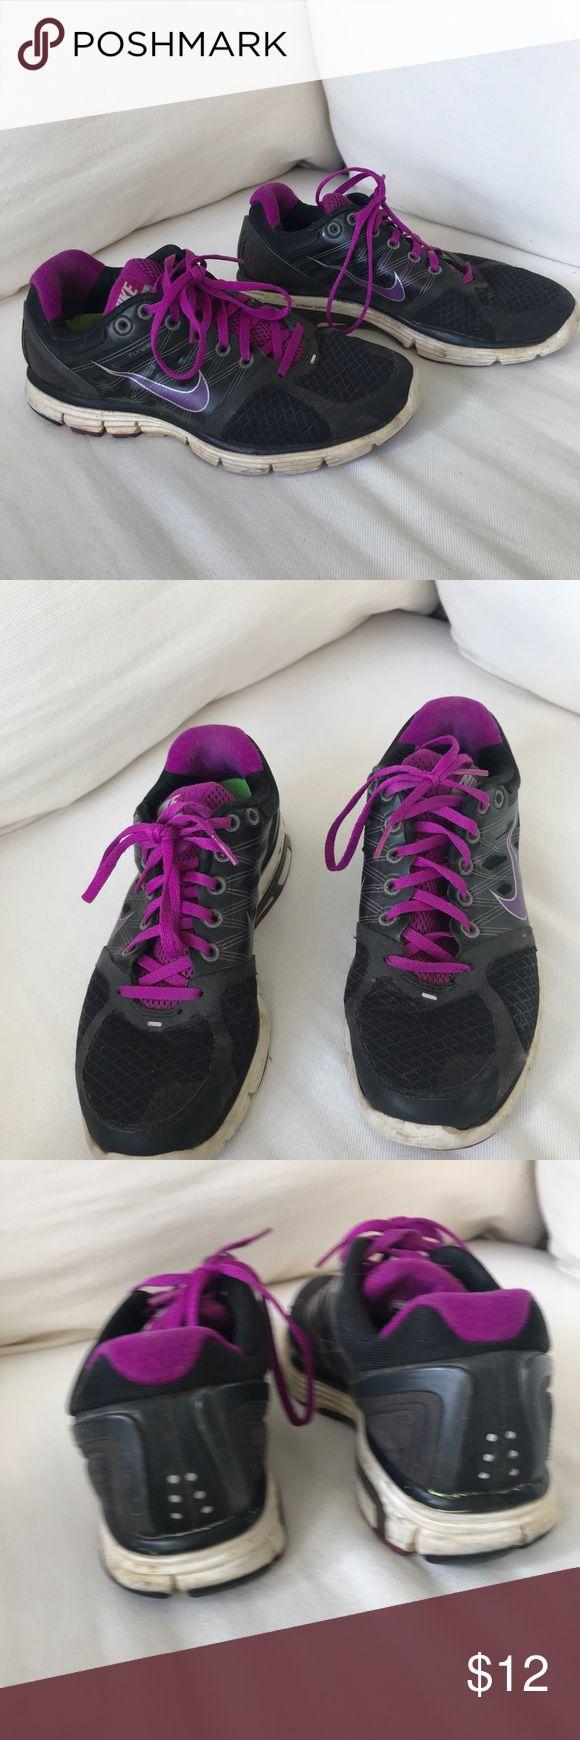 Woman's Nike Sneakers Lunarglide 2 Woman's Nike Sneakers in black Nike Shoes Sneakers